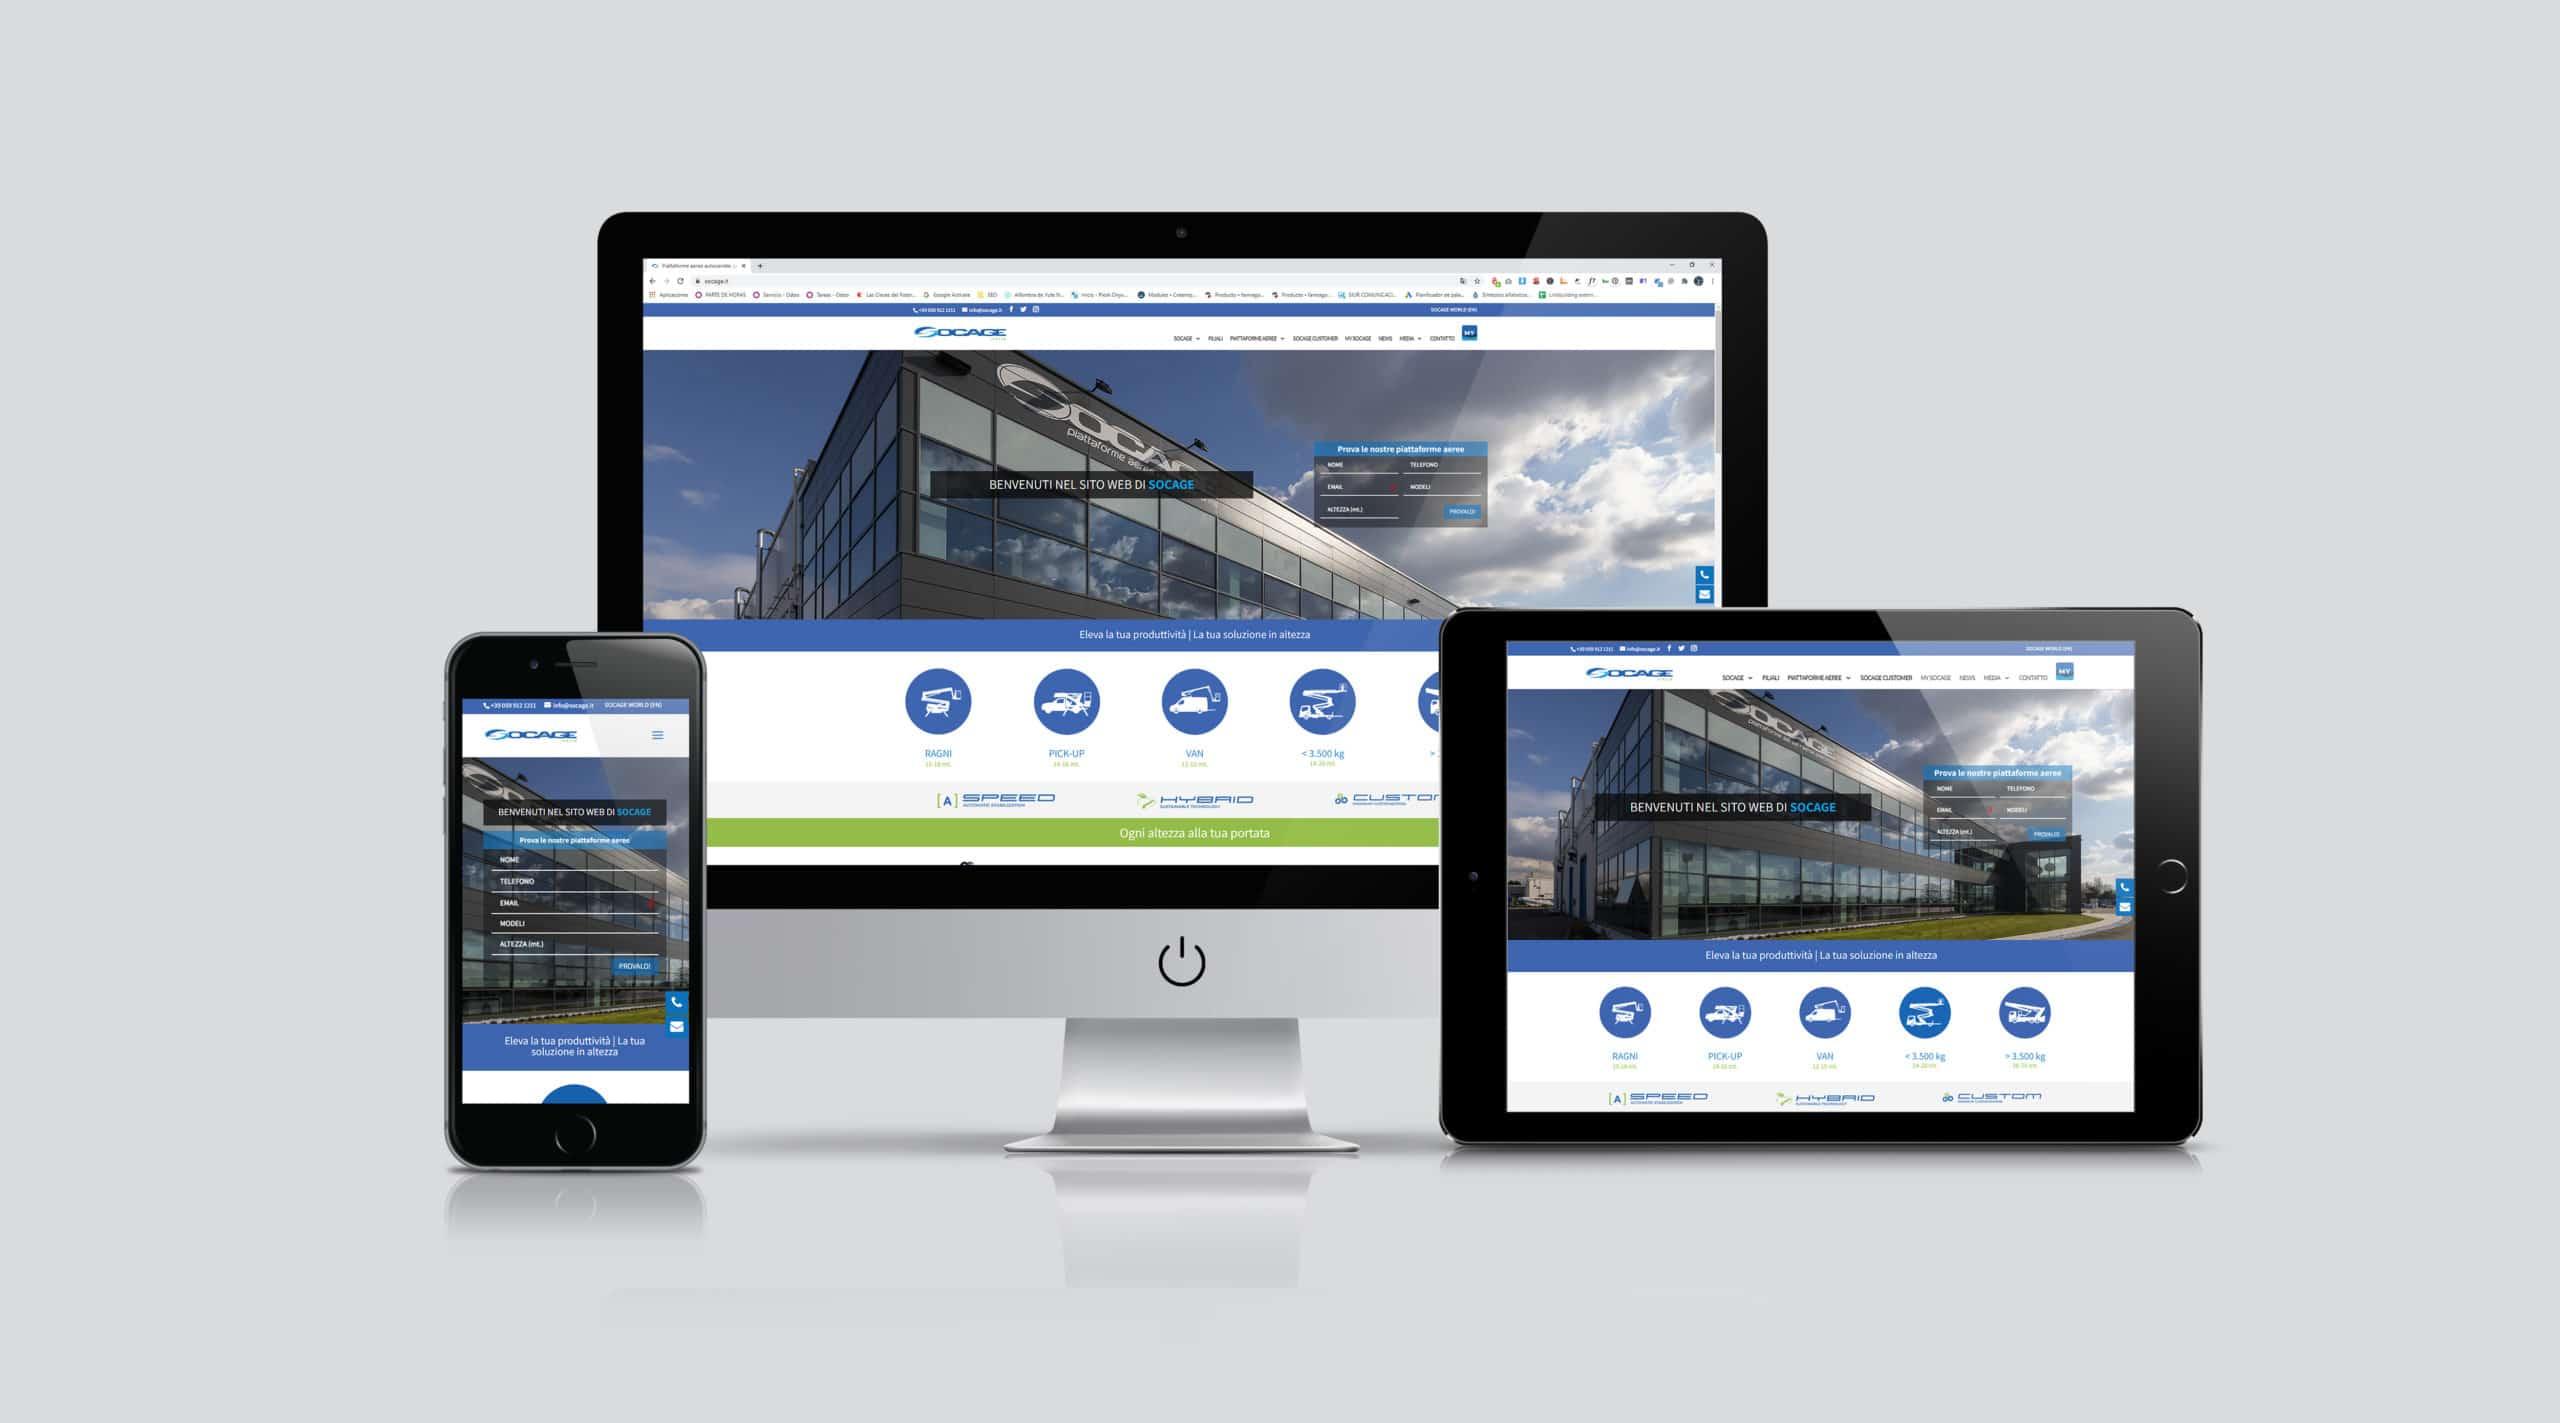 Socage web piattaforme aeree